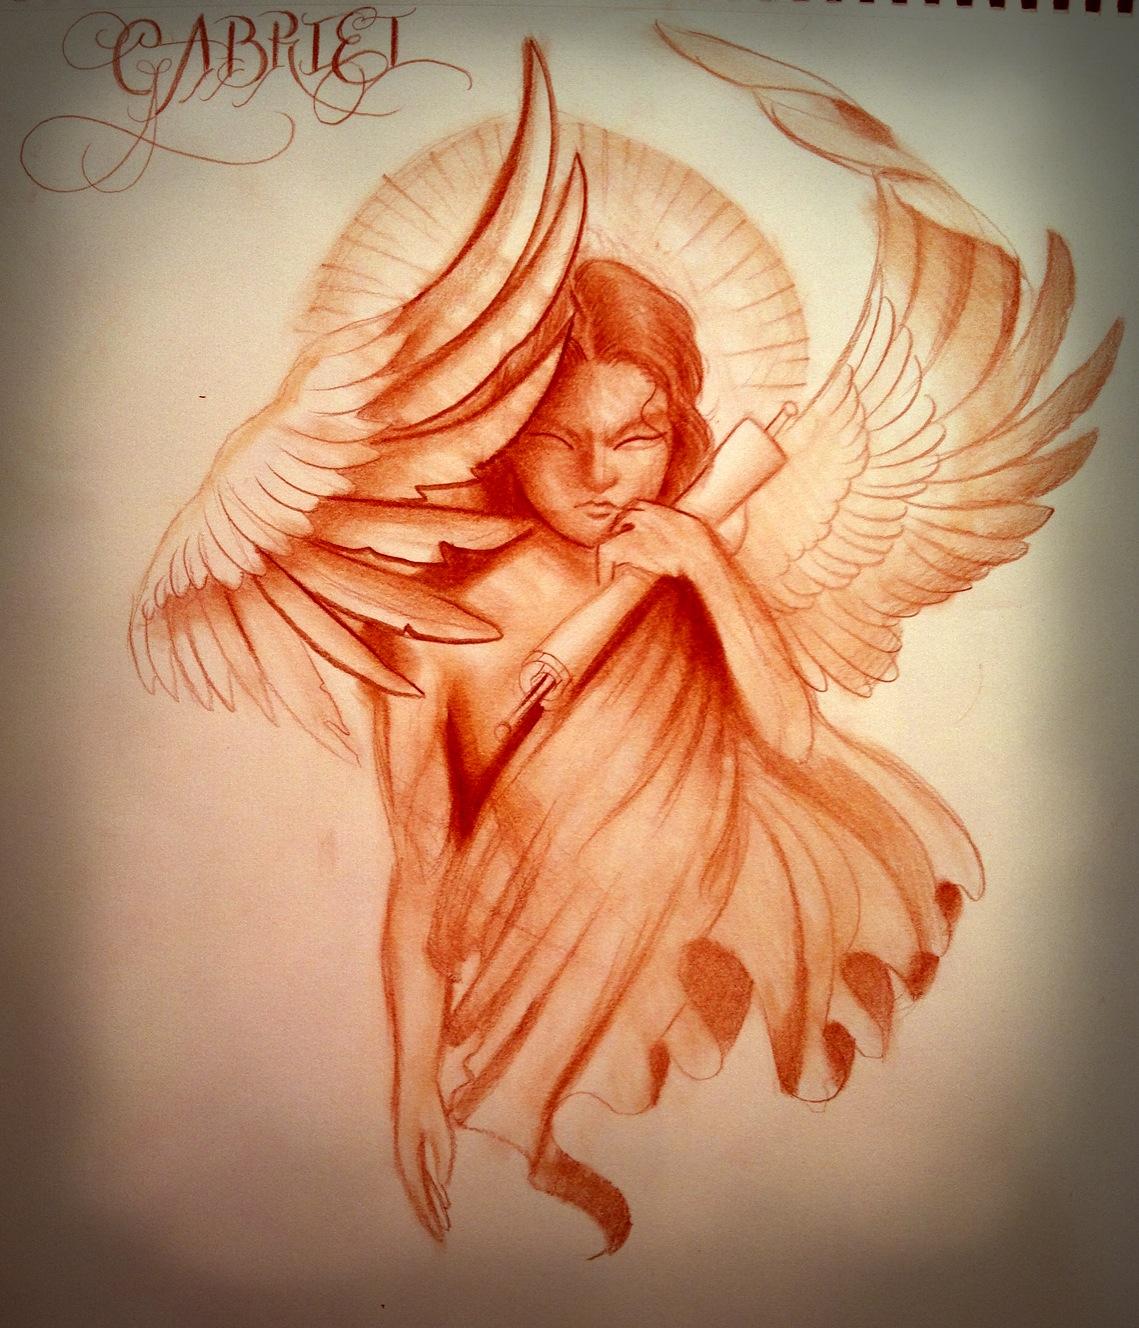 Archangel Gabriel Tattoo Designs Wwwgalleryhipcom The Hippest Pics